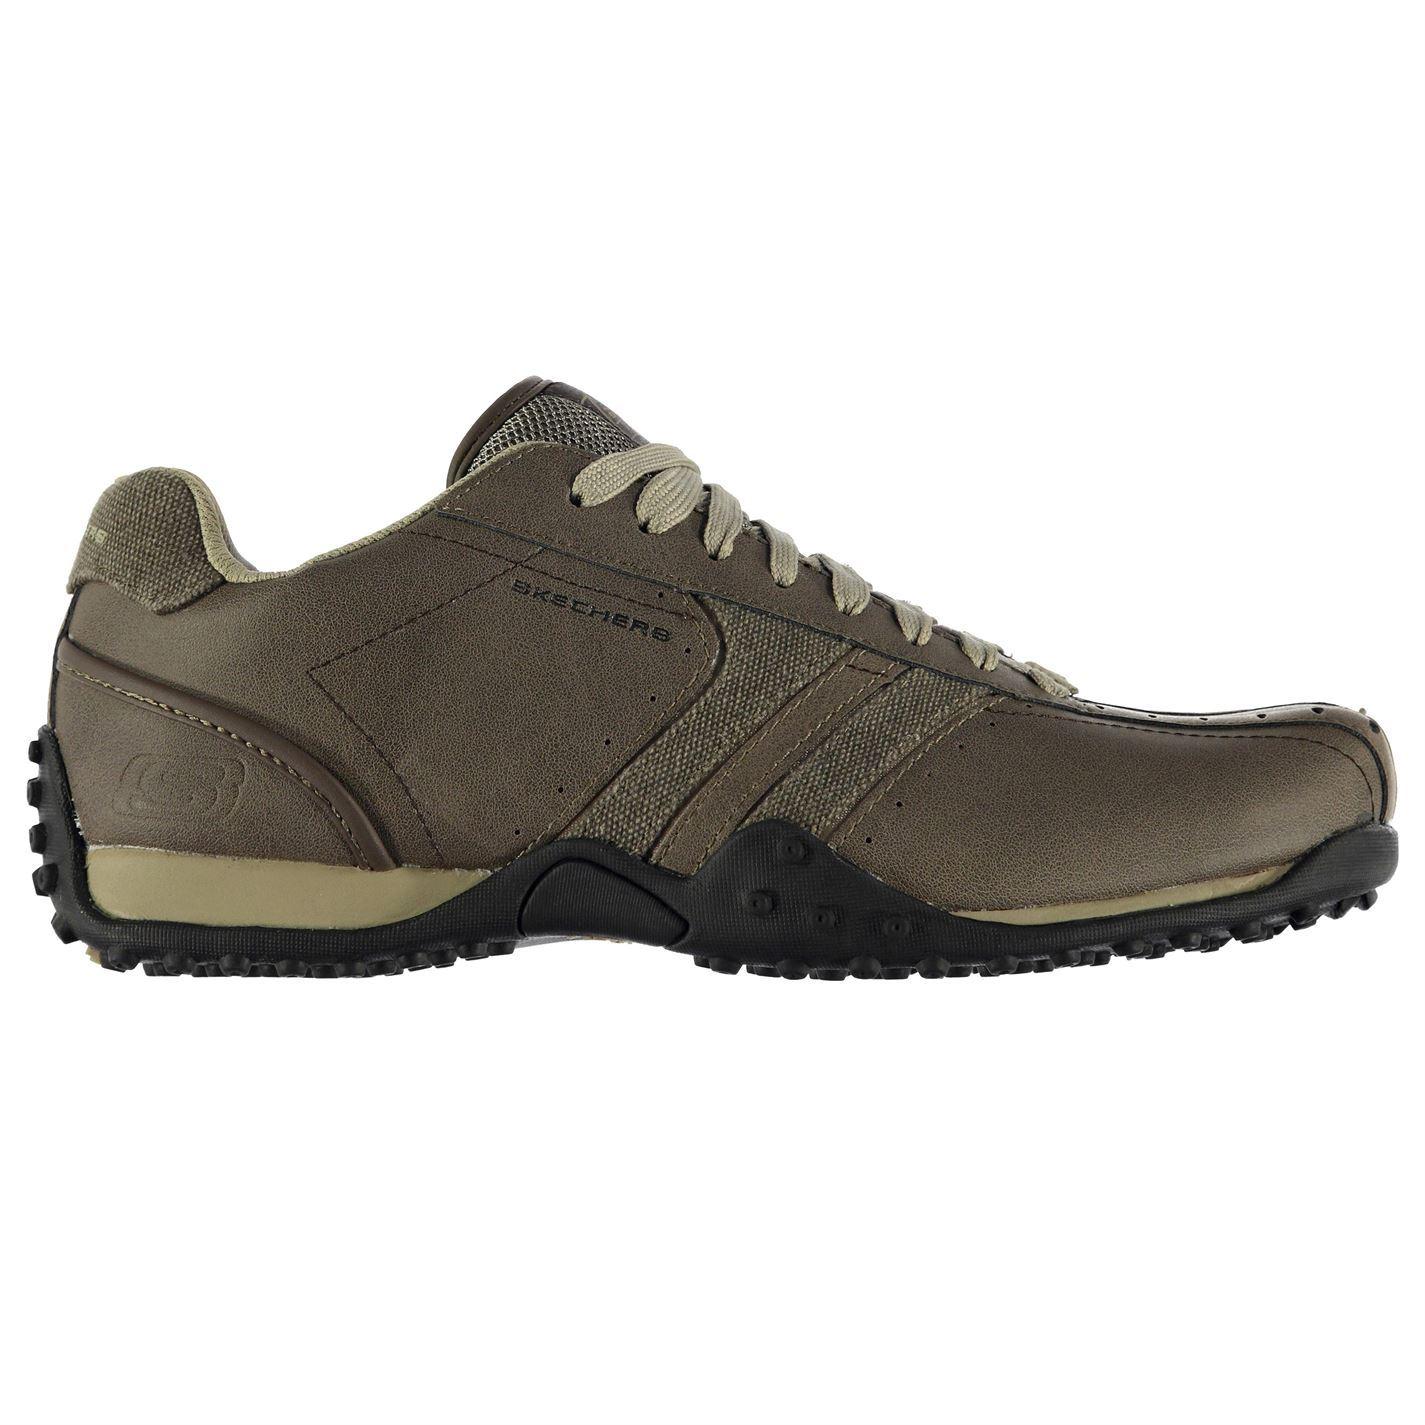 Skechers-Urban-Track-Forward-Trainers-Mens-Athleisure-Footwear-Shoes-Sneakers thumbnail 19